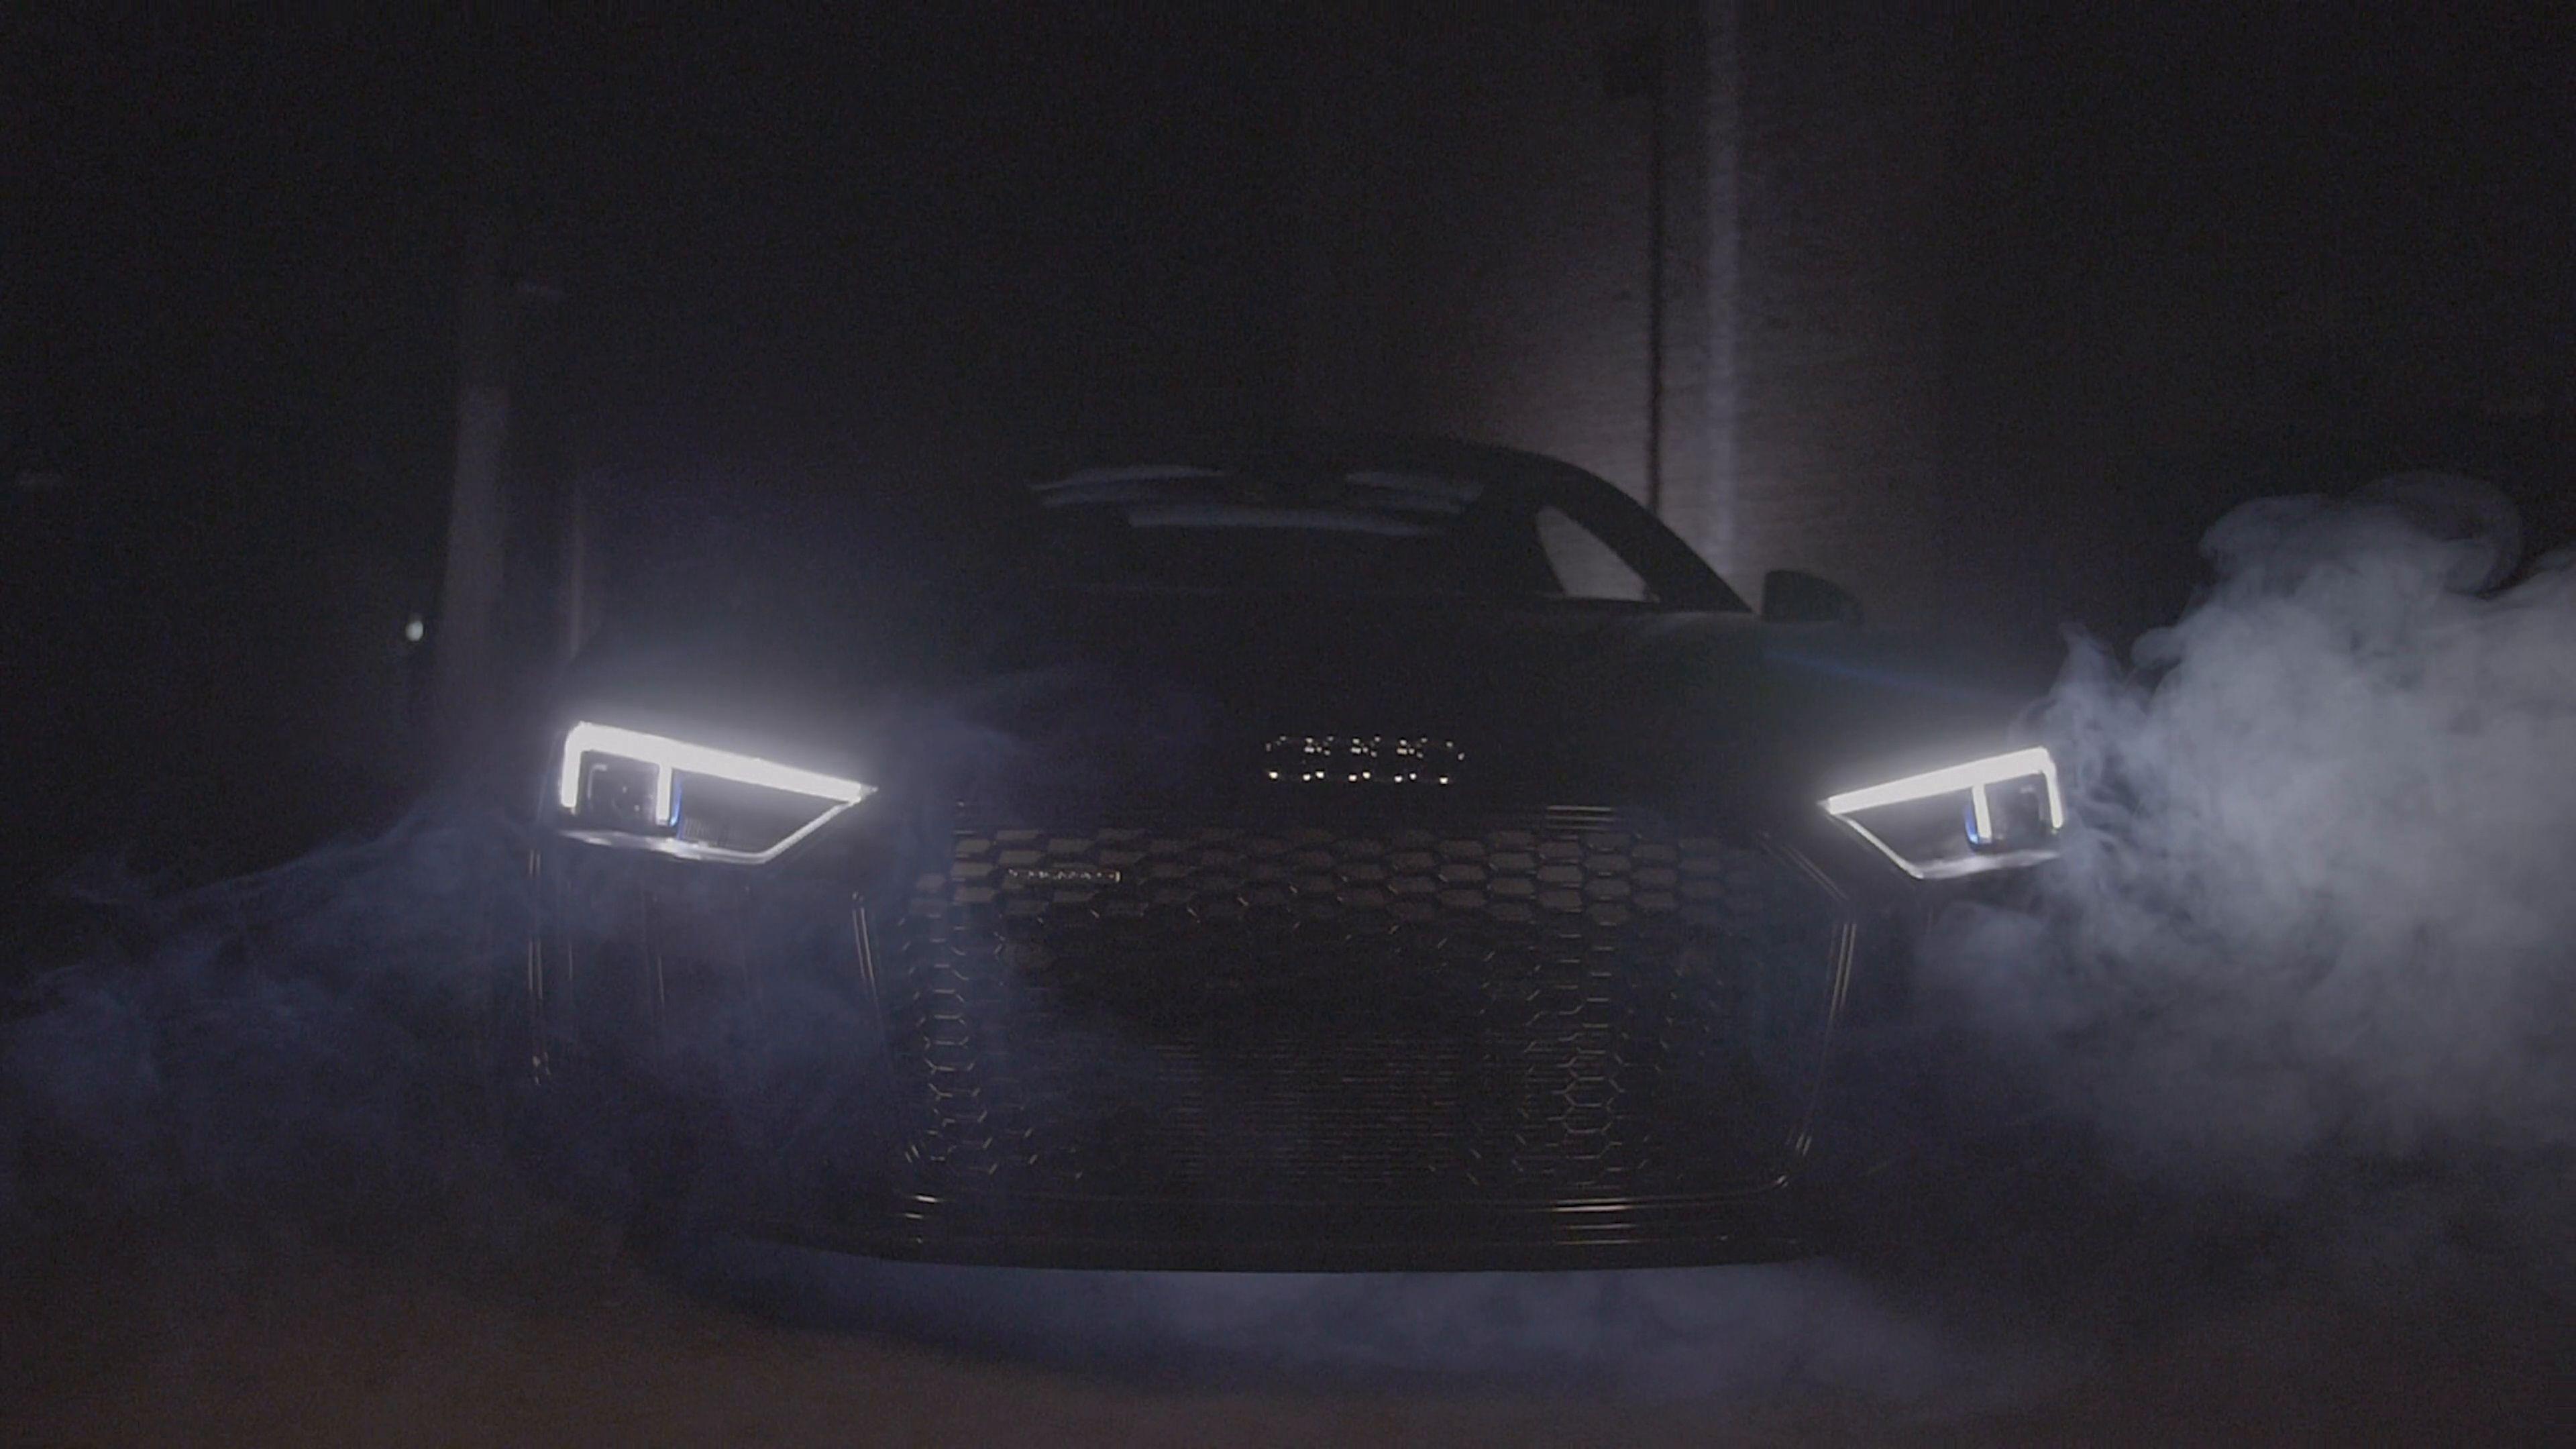 Audi R8 Smoke Underneat Car Slow Motion Stock Footage Smoke Underneat Audi Car Audi R8 Audi Illustration Water